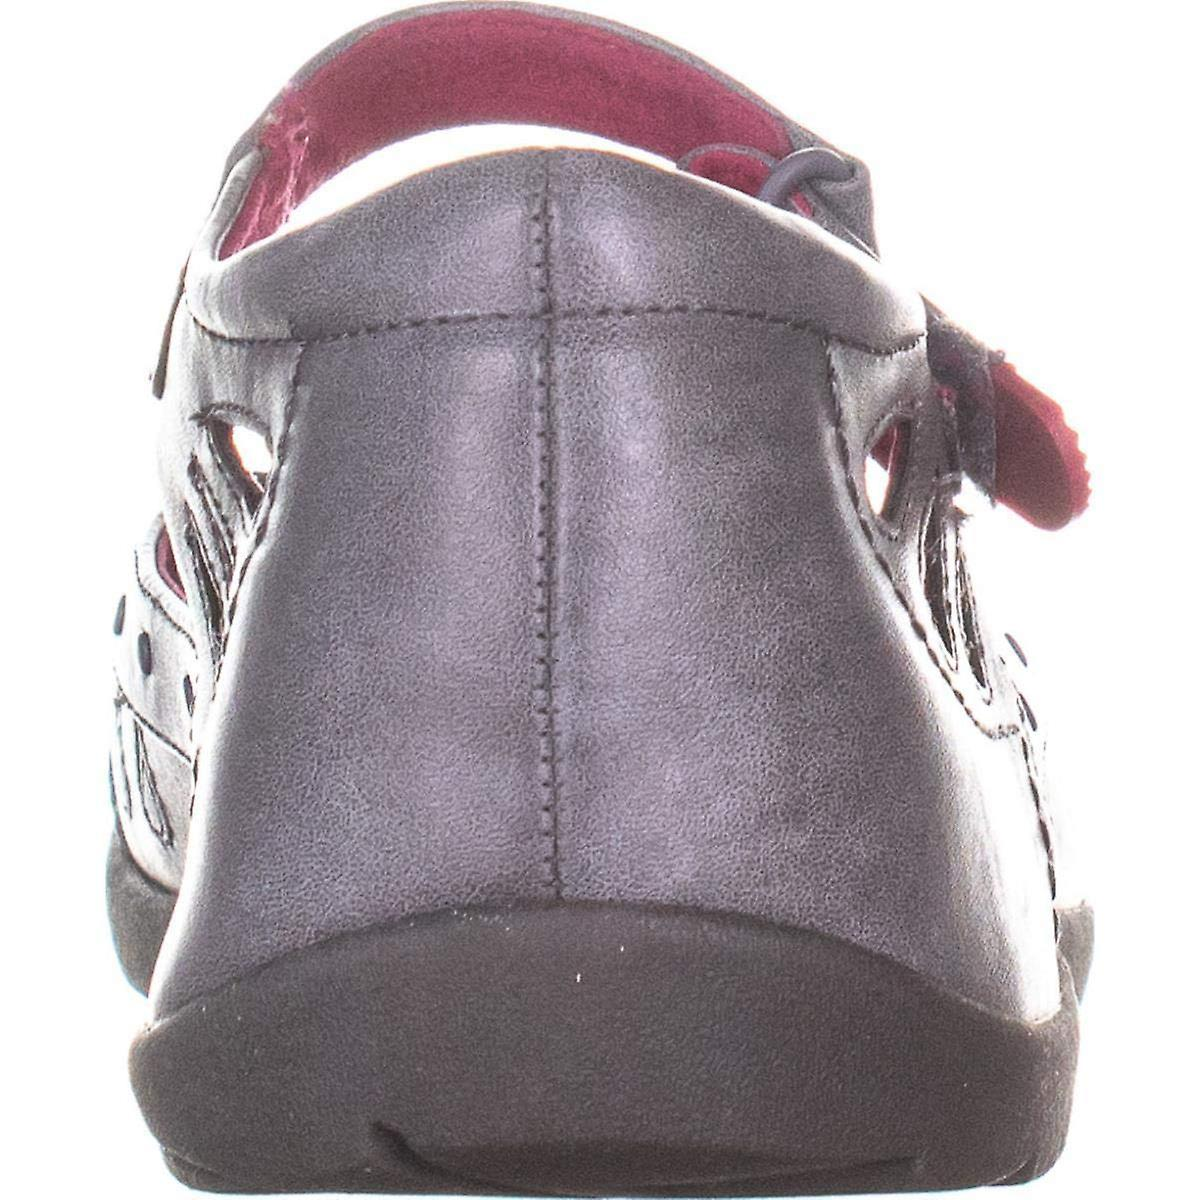 BareTraps Fayden Ankle Strap Flats, Grigio scuro, 7.5 US  LHGFft